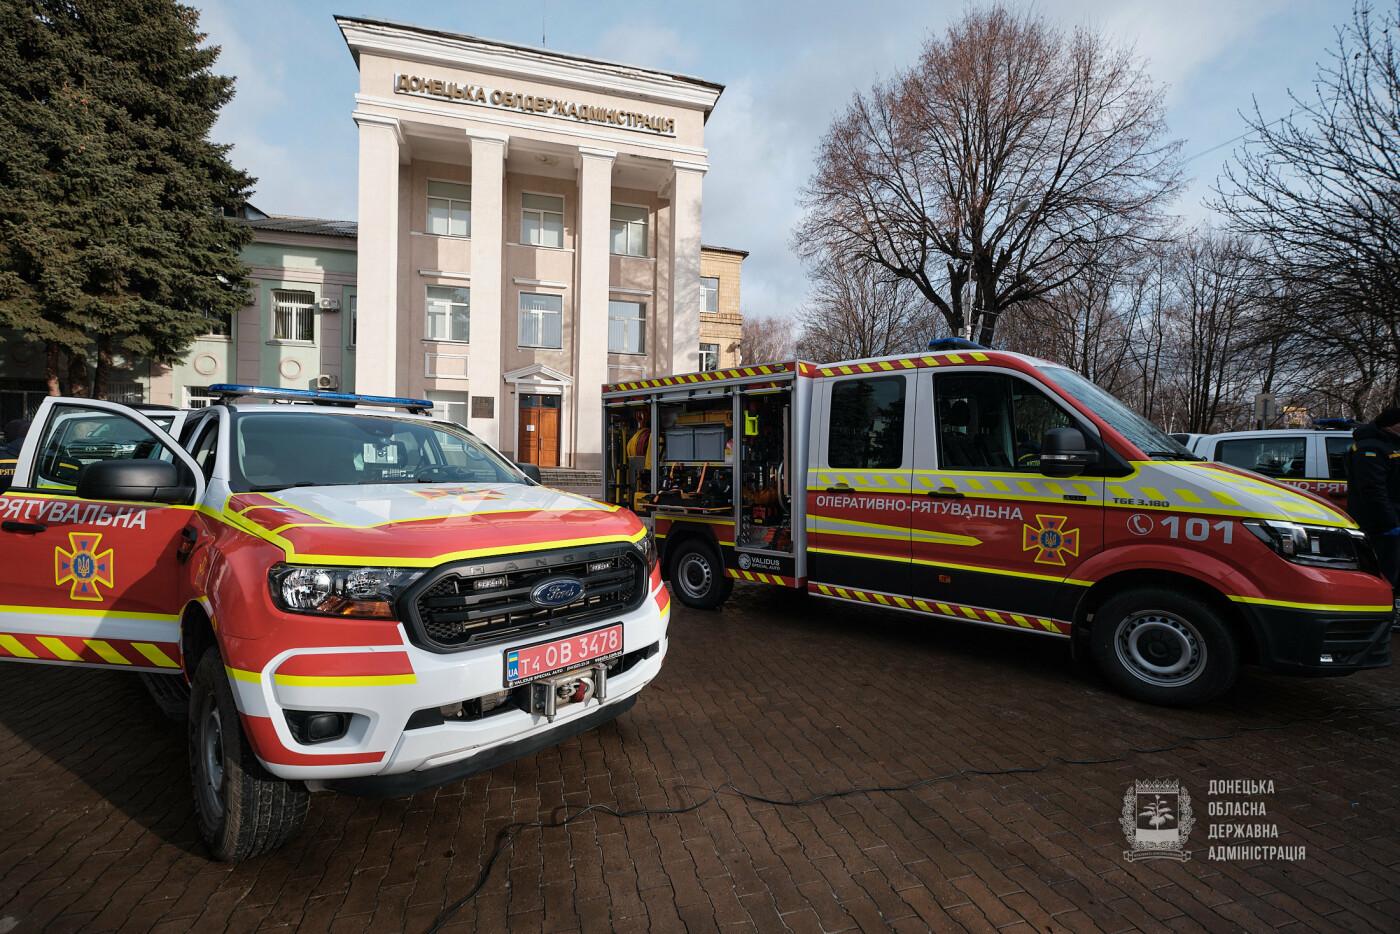 Слов'янські рятувальники отримали нову пожежну автоцистерну, фото-17